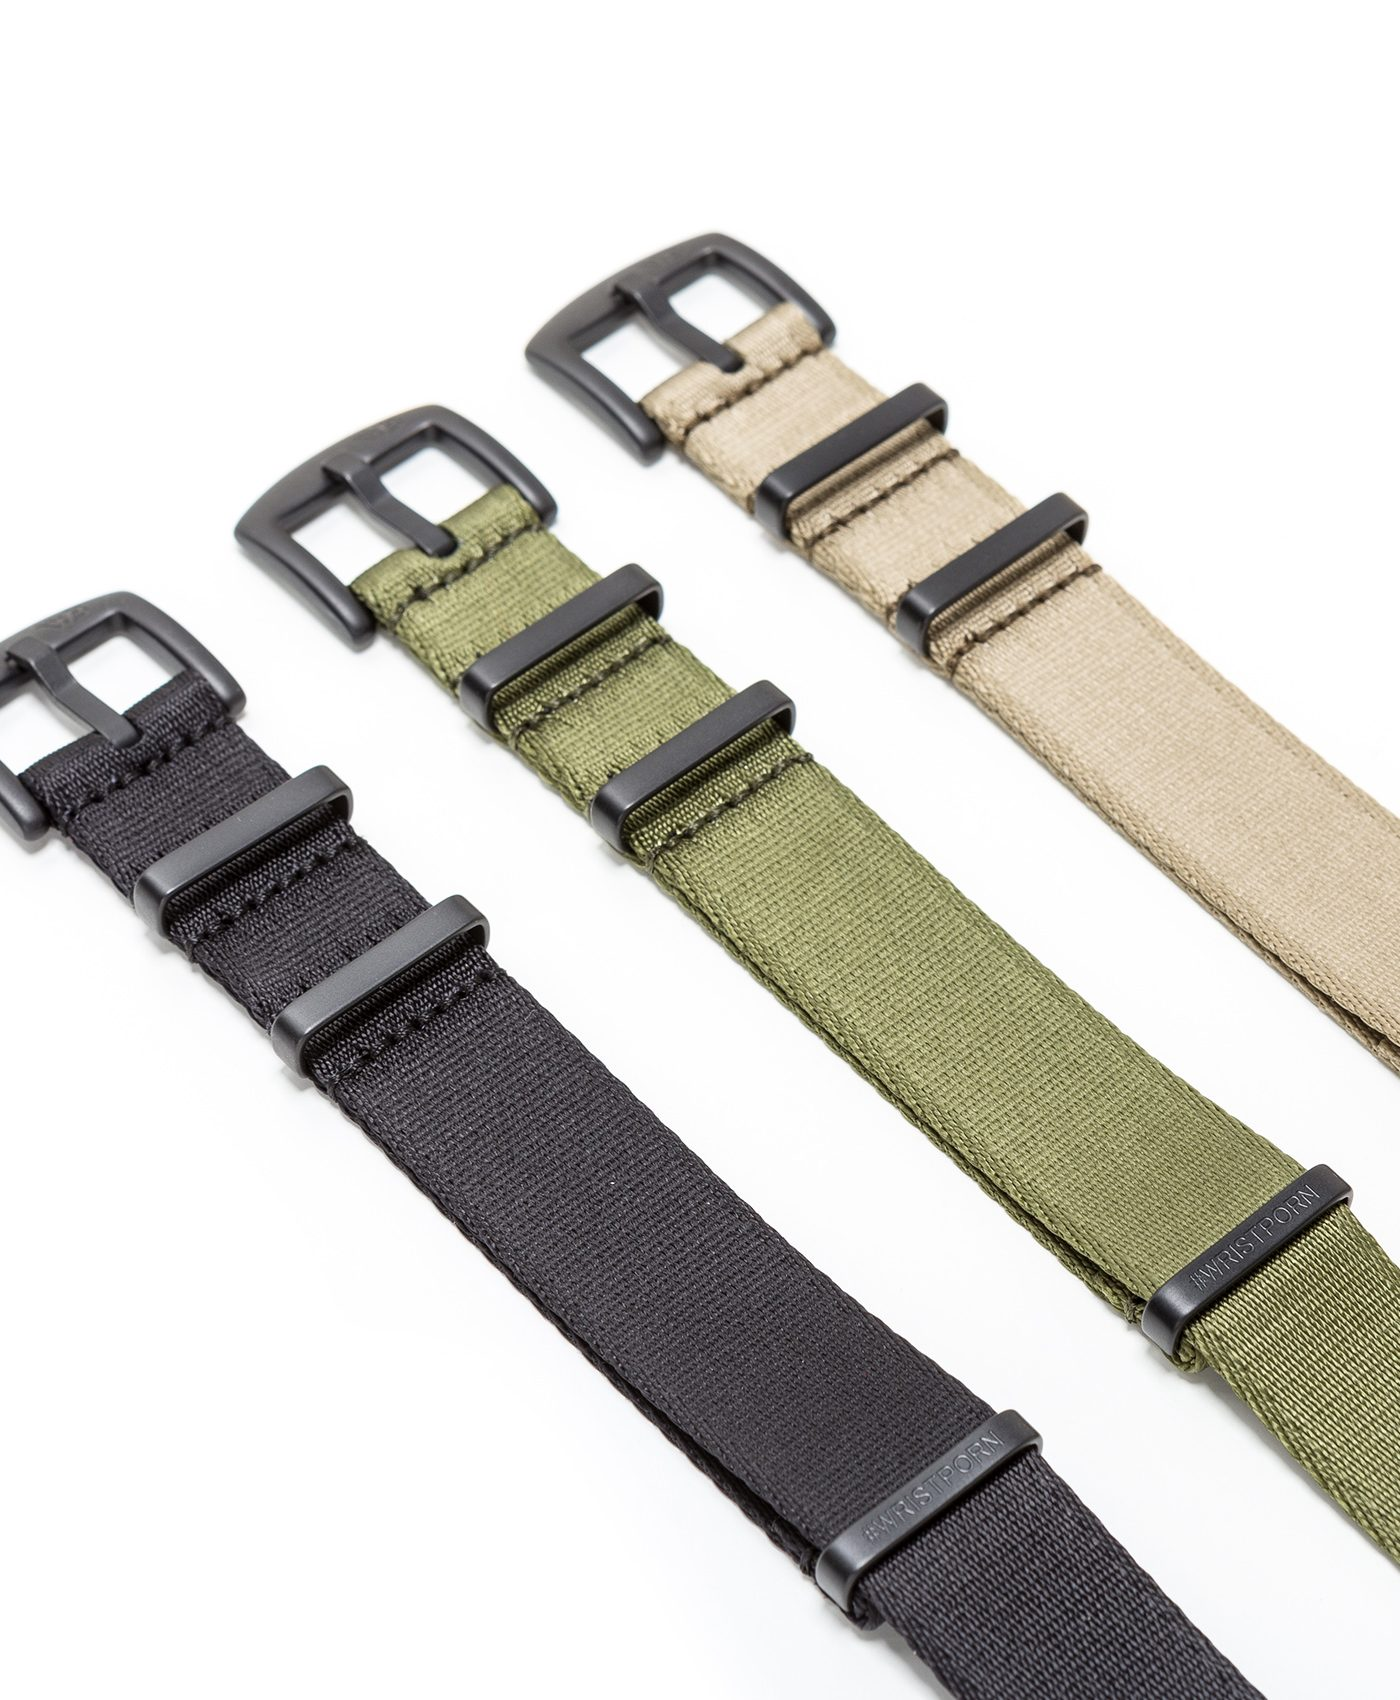 Watchbandit WB original Wristporn Nato straps bundle side view